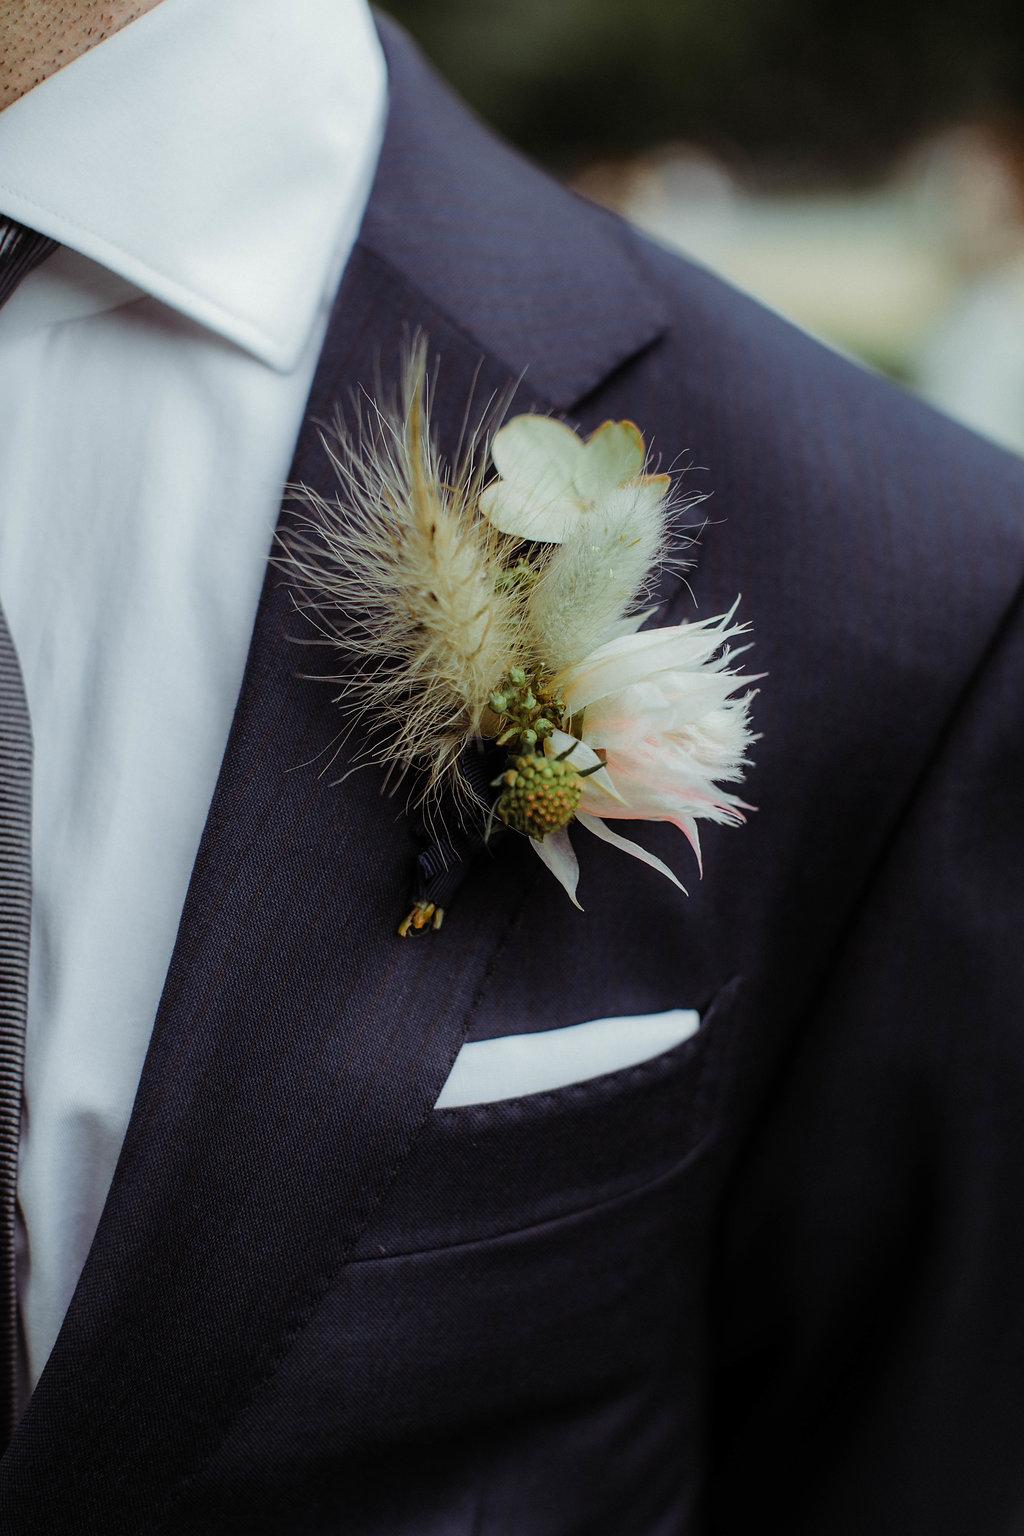 conservatory-garden-wedding-amber-gress-0006-.jpg